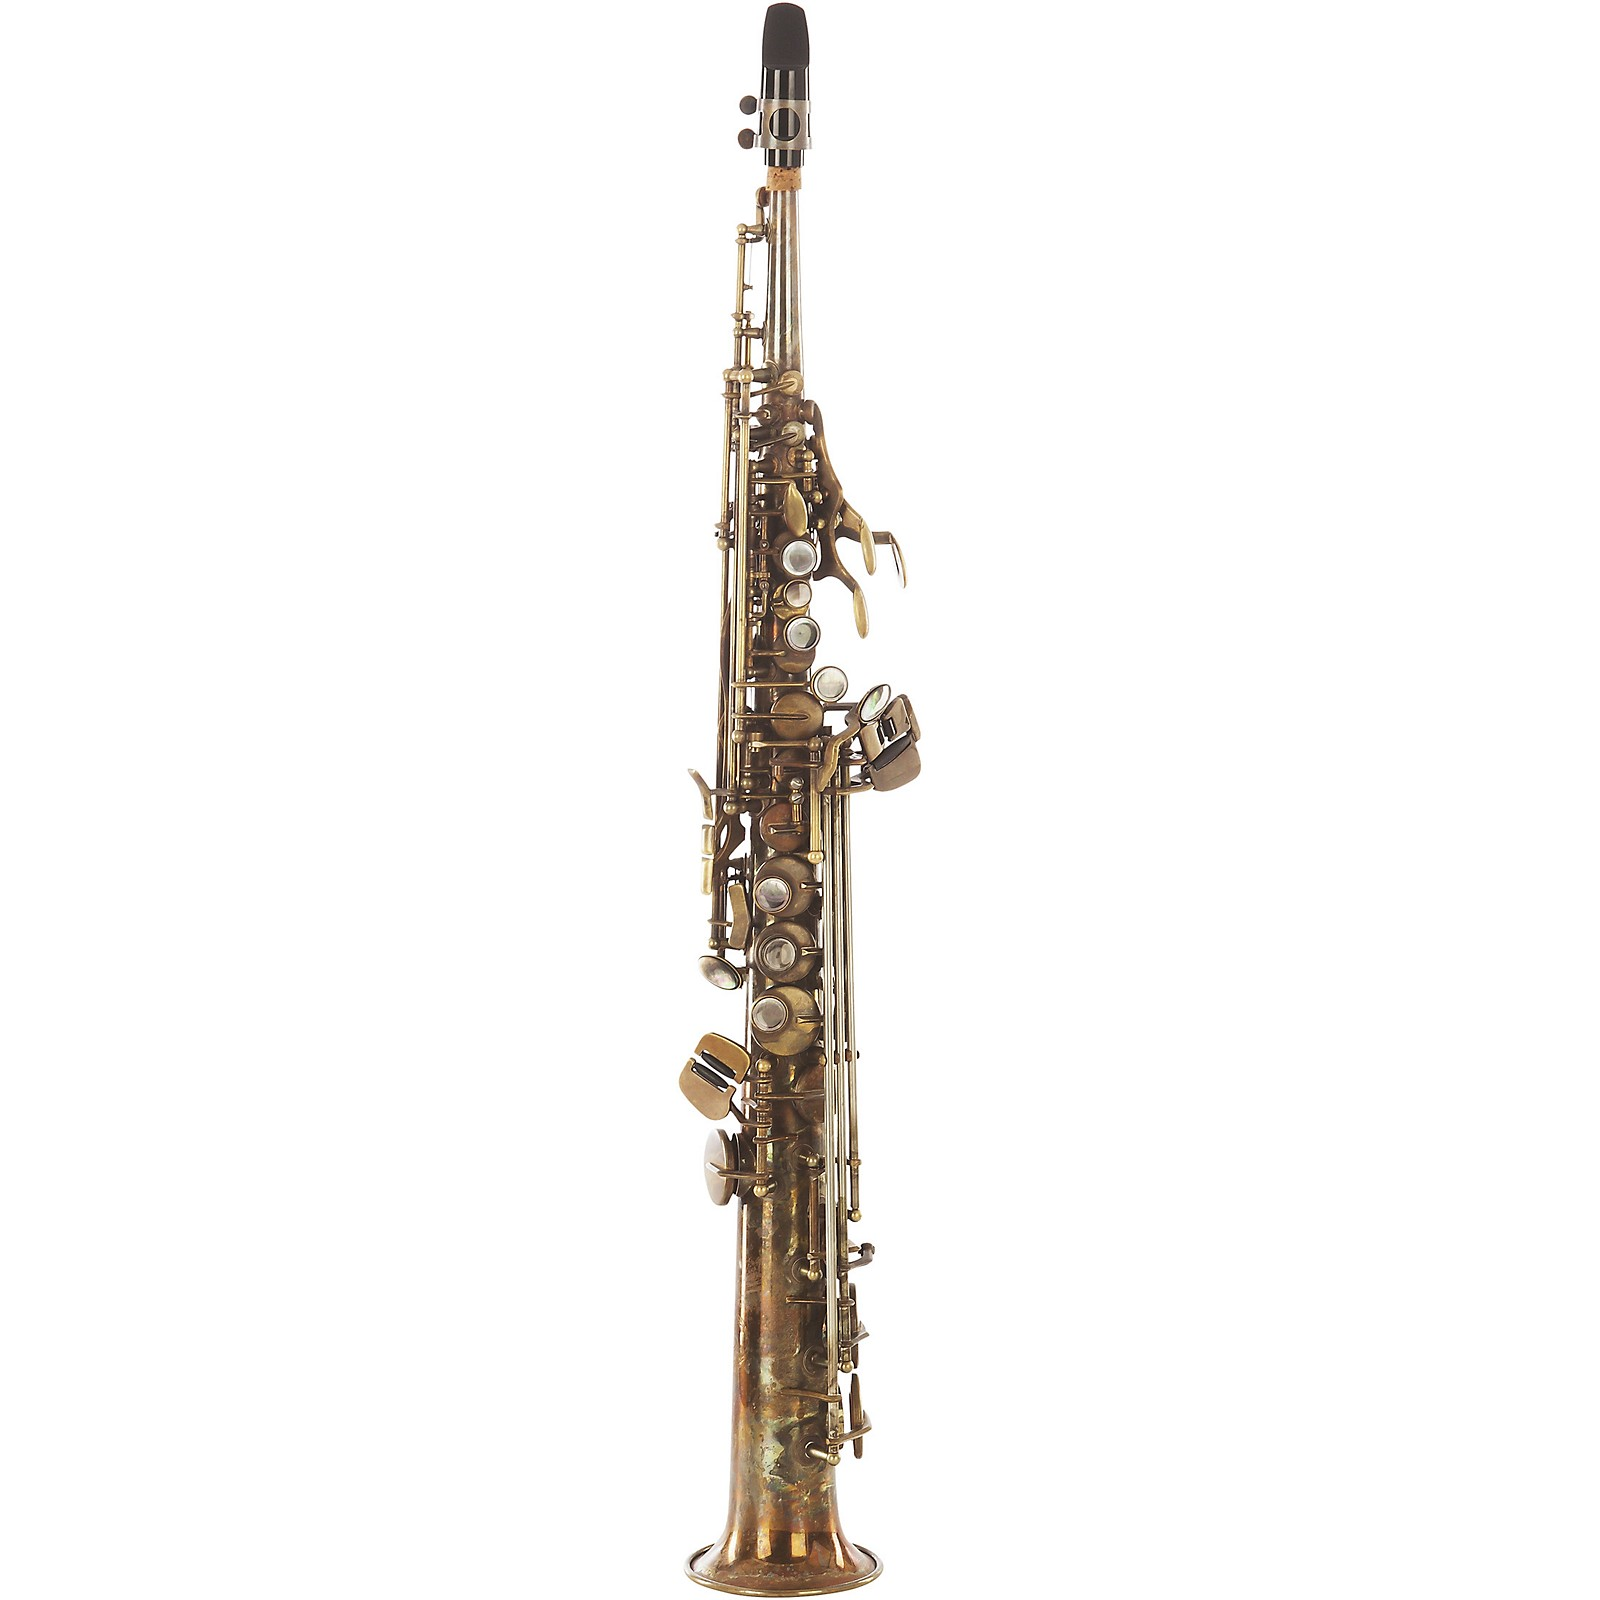 Sax Dakota SDSS-XR 72 Professional Straight Soprano Saxophone